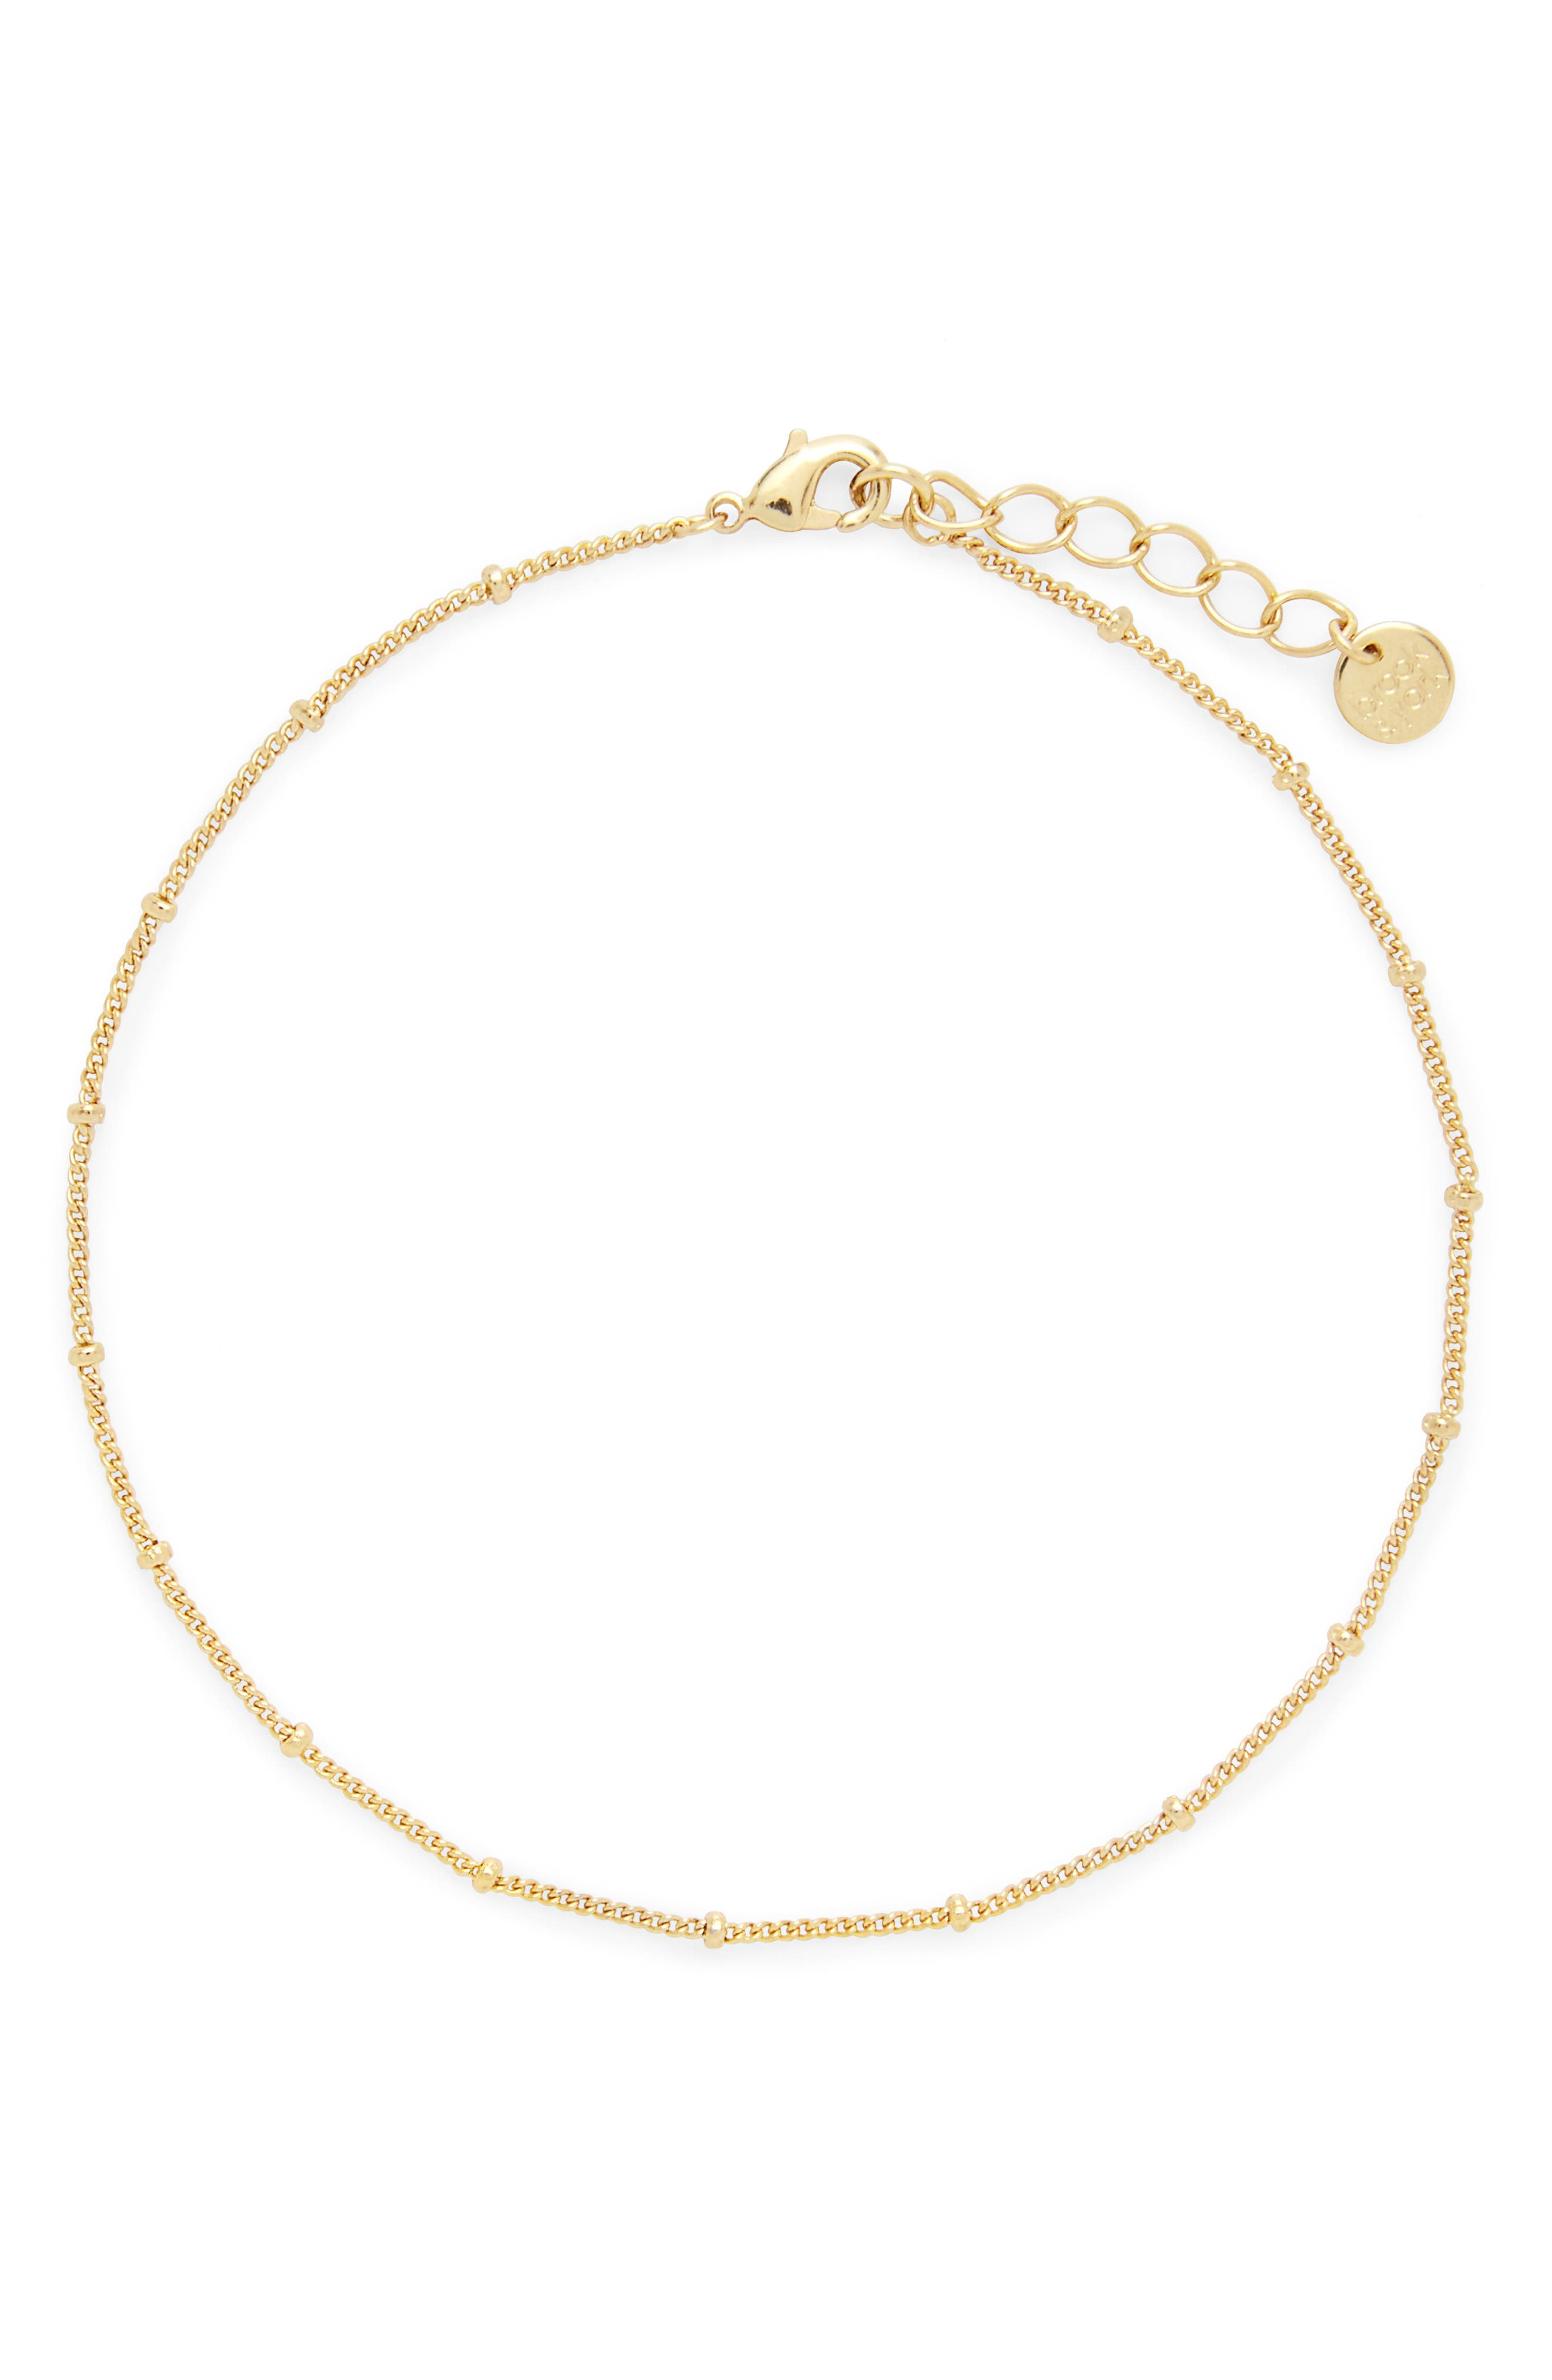 Madeline Chain Ankle Bracelet